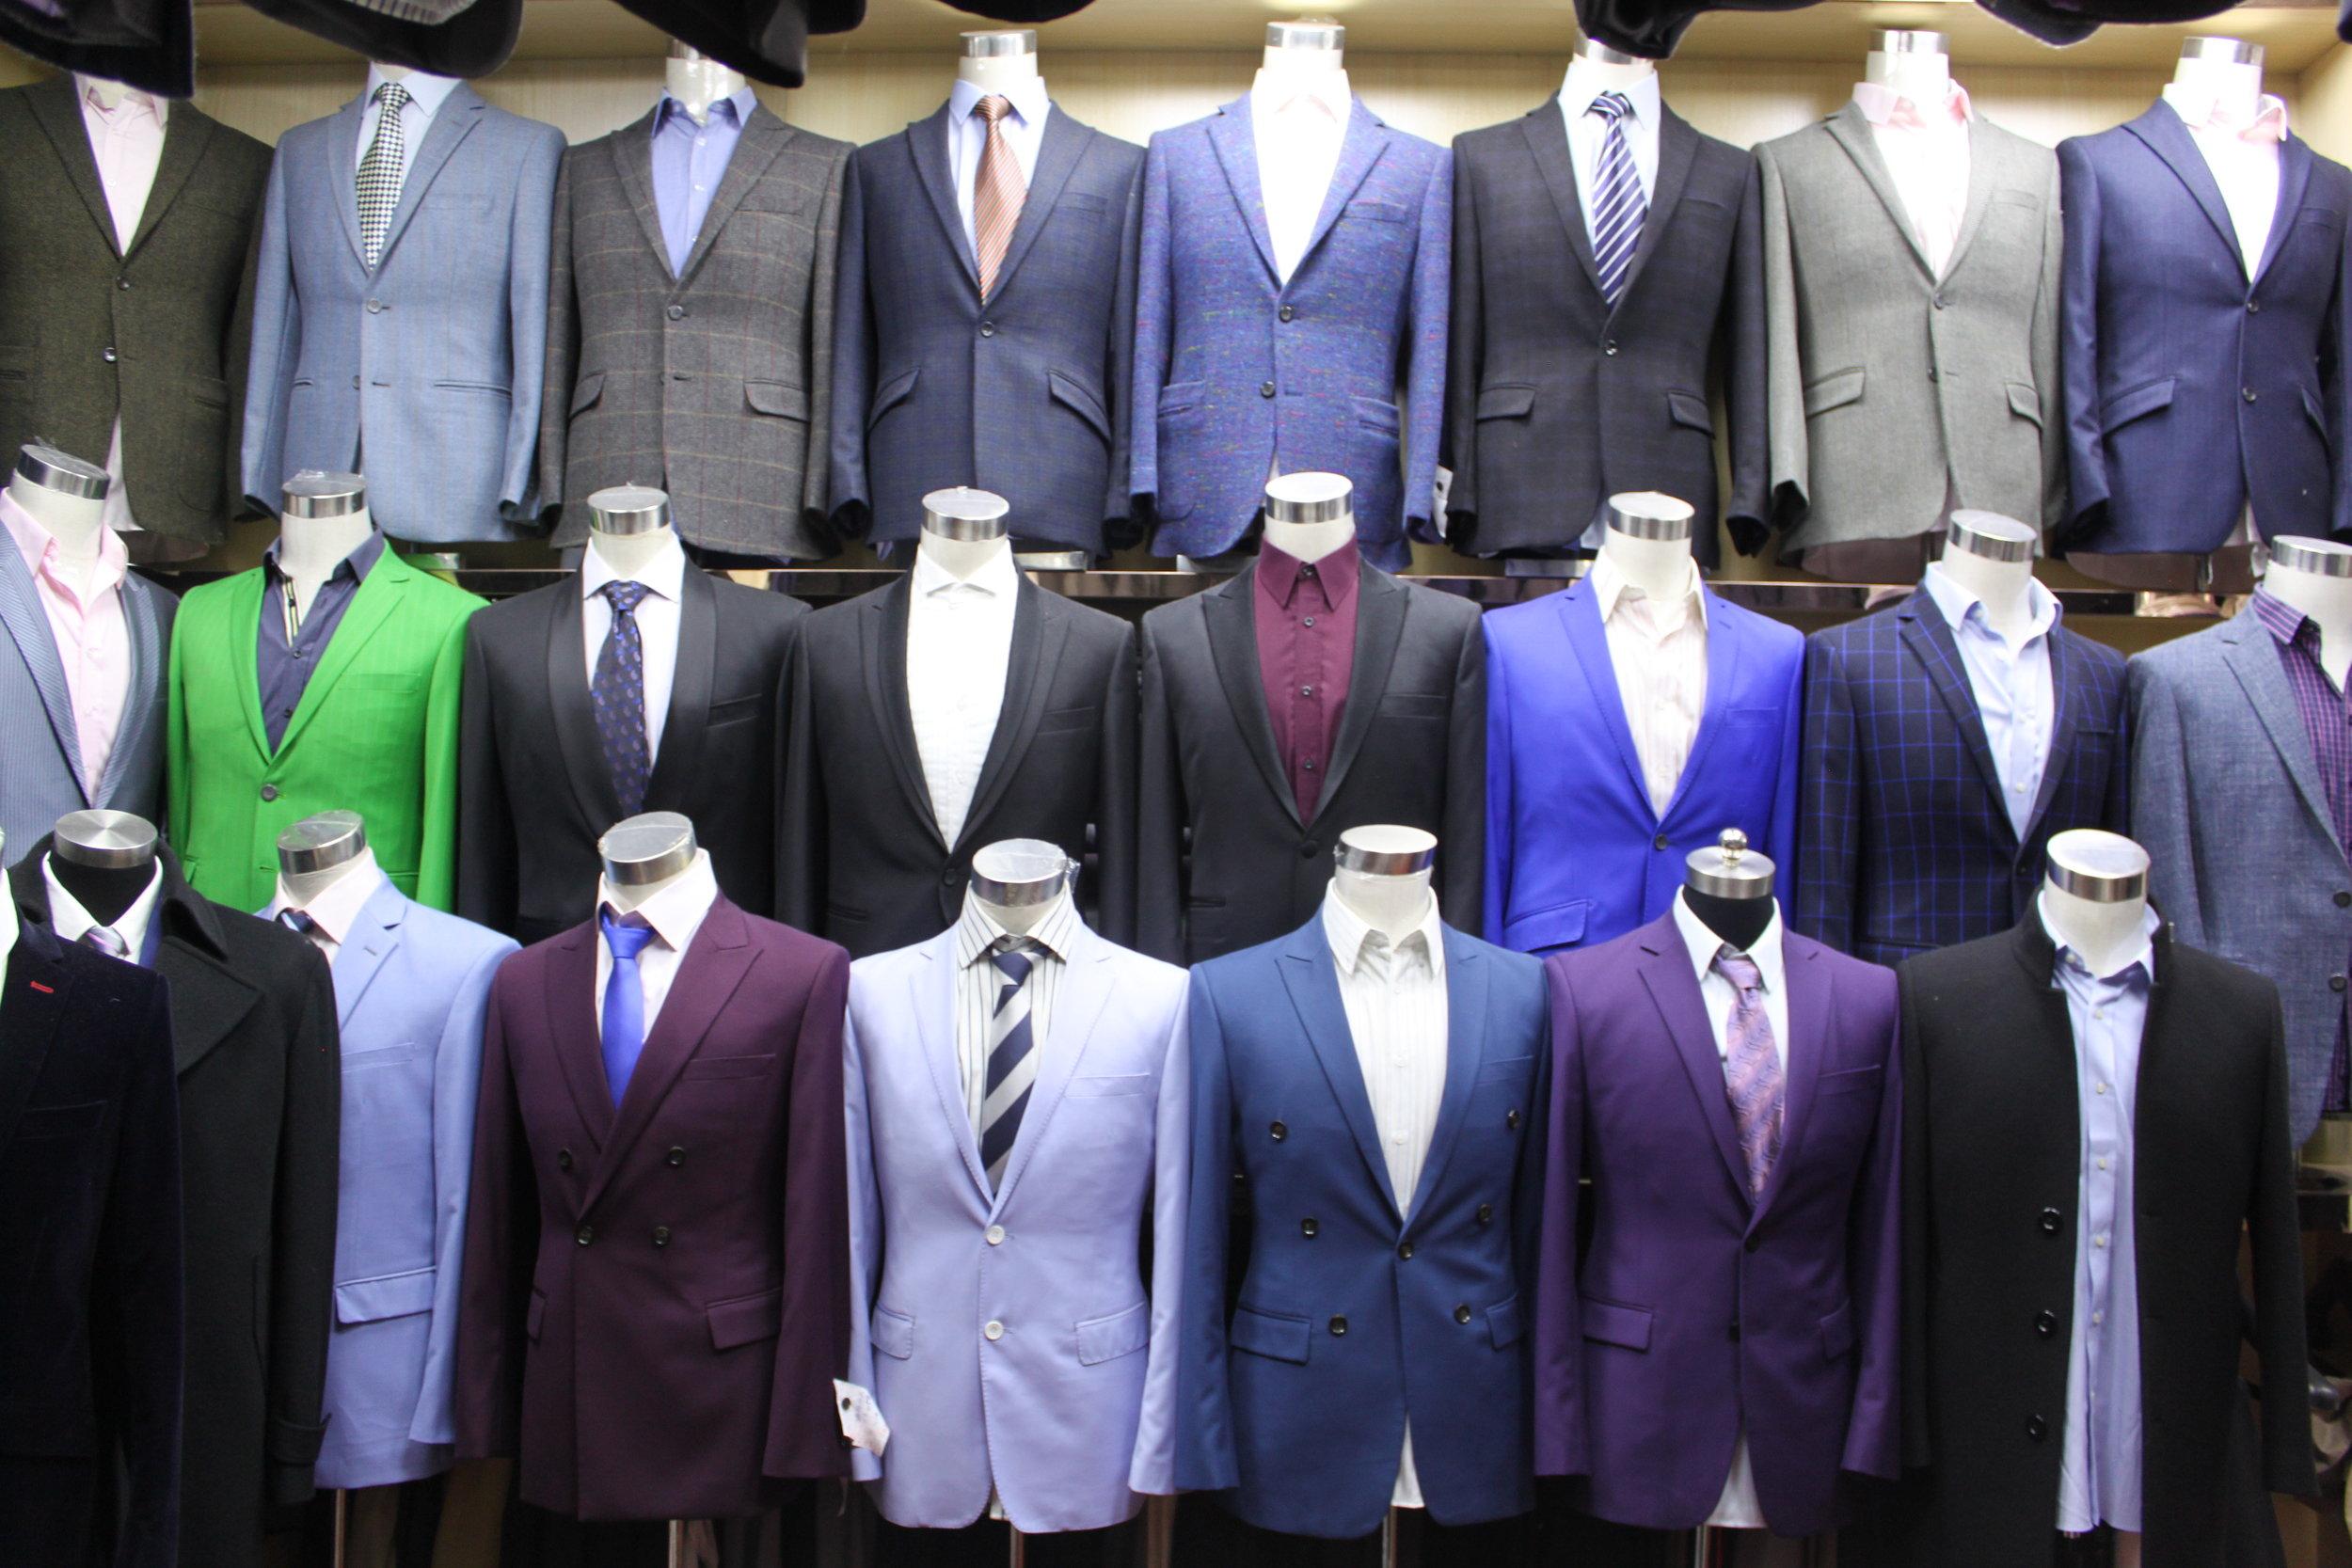 tailor-made-shanghai-sightseeing-tour-south-bund-fabric-market